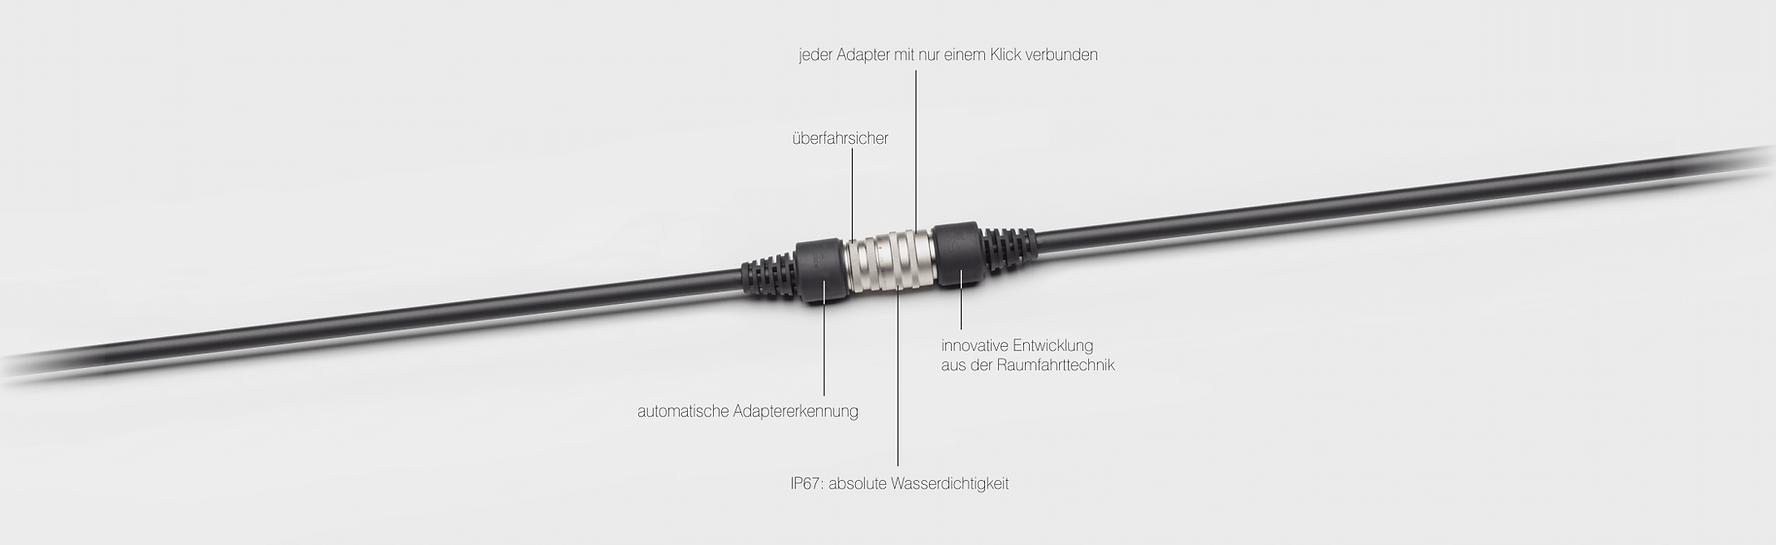 Juice Connector Ladekabel für Elektroautos